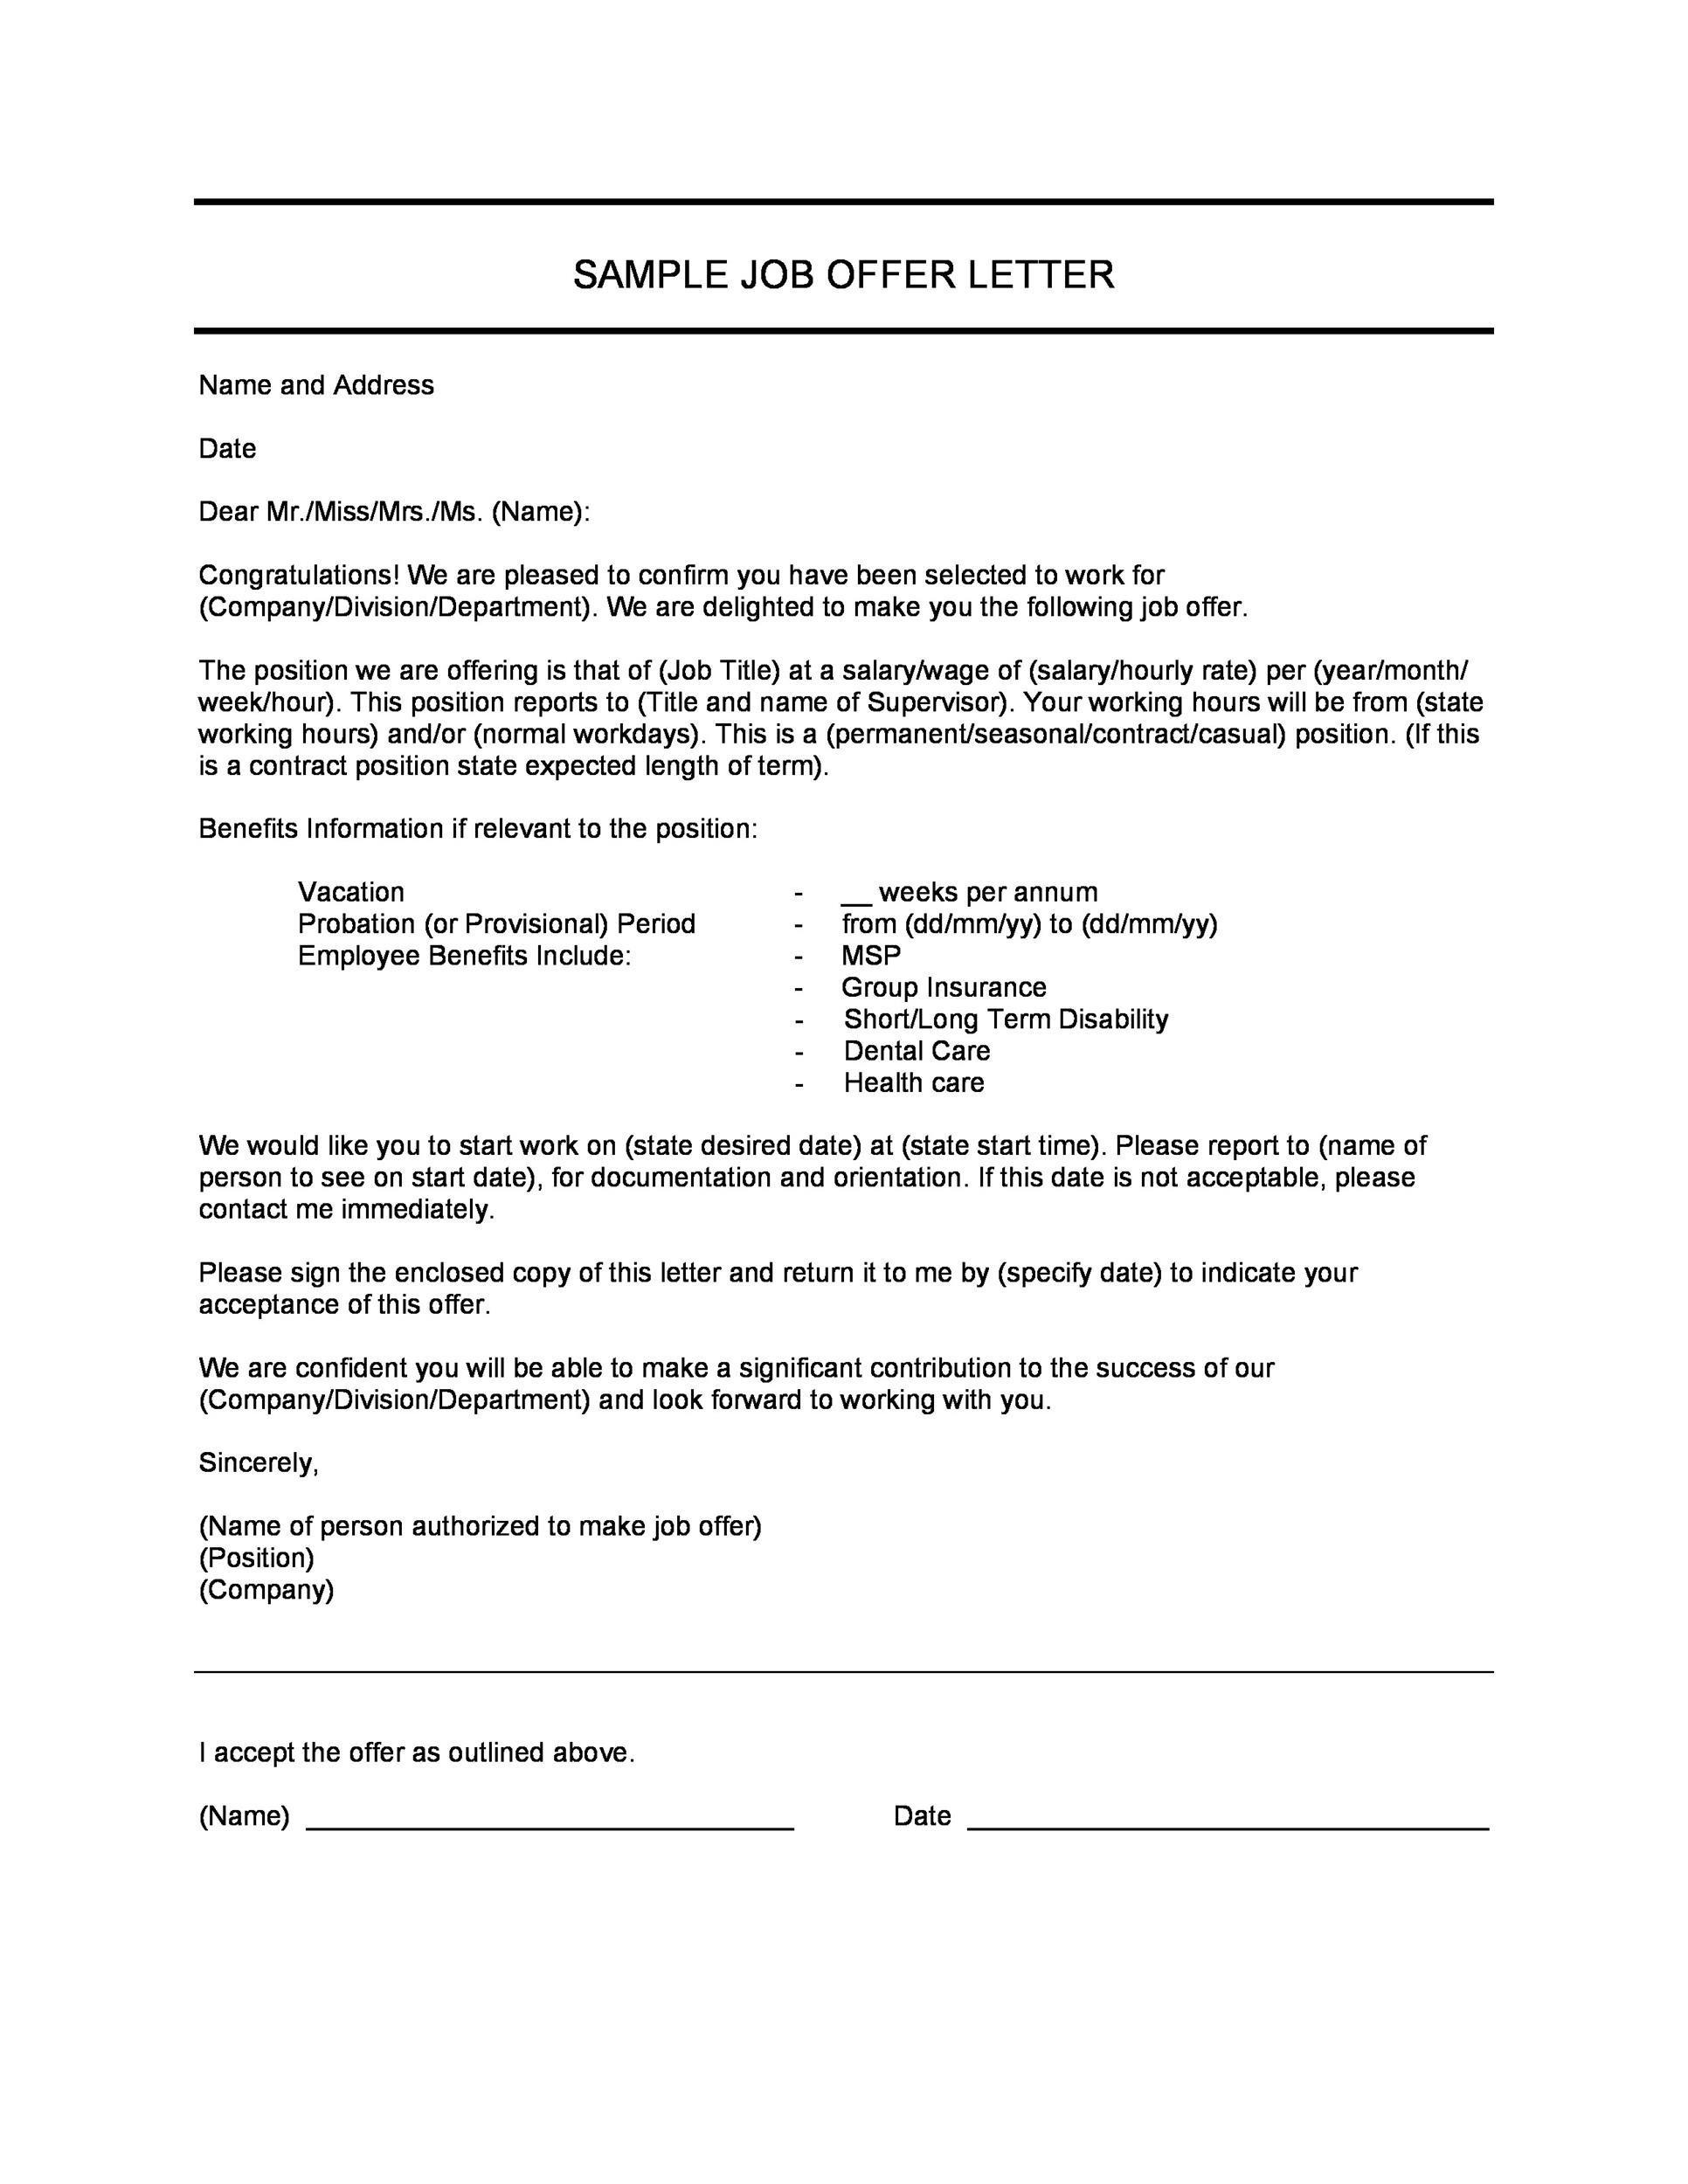 Sample Job Offer Letter Probationary Period Best Resumes